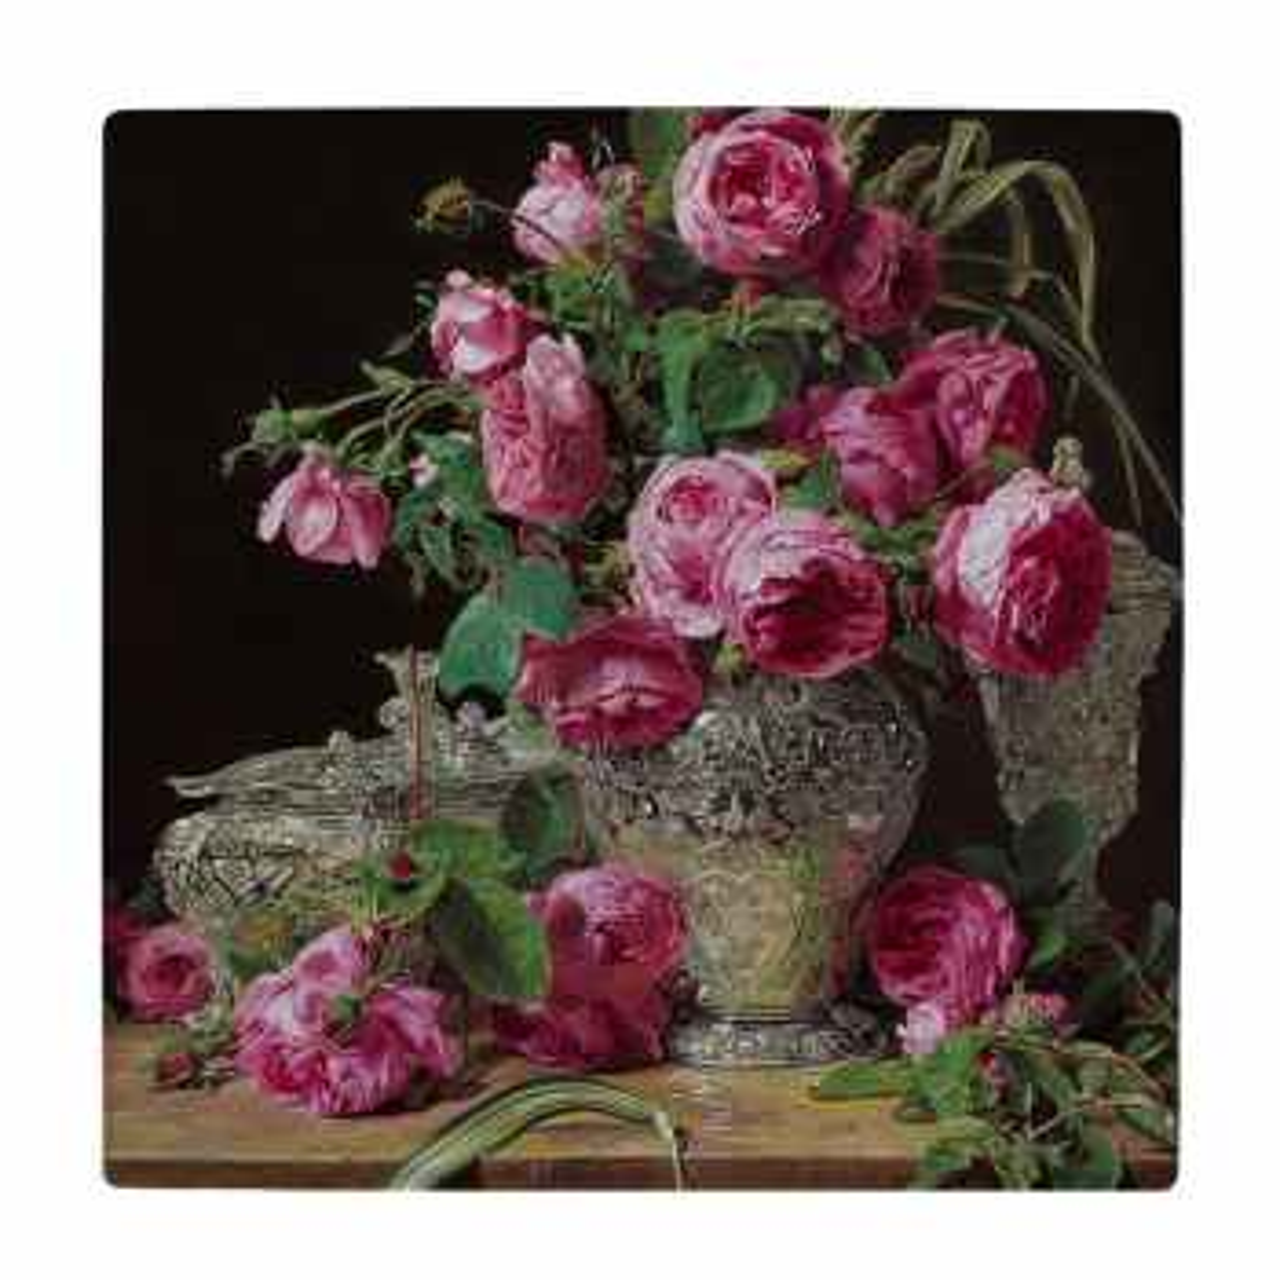 کاشی طرح نقاشی گلدان گل کد wk613